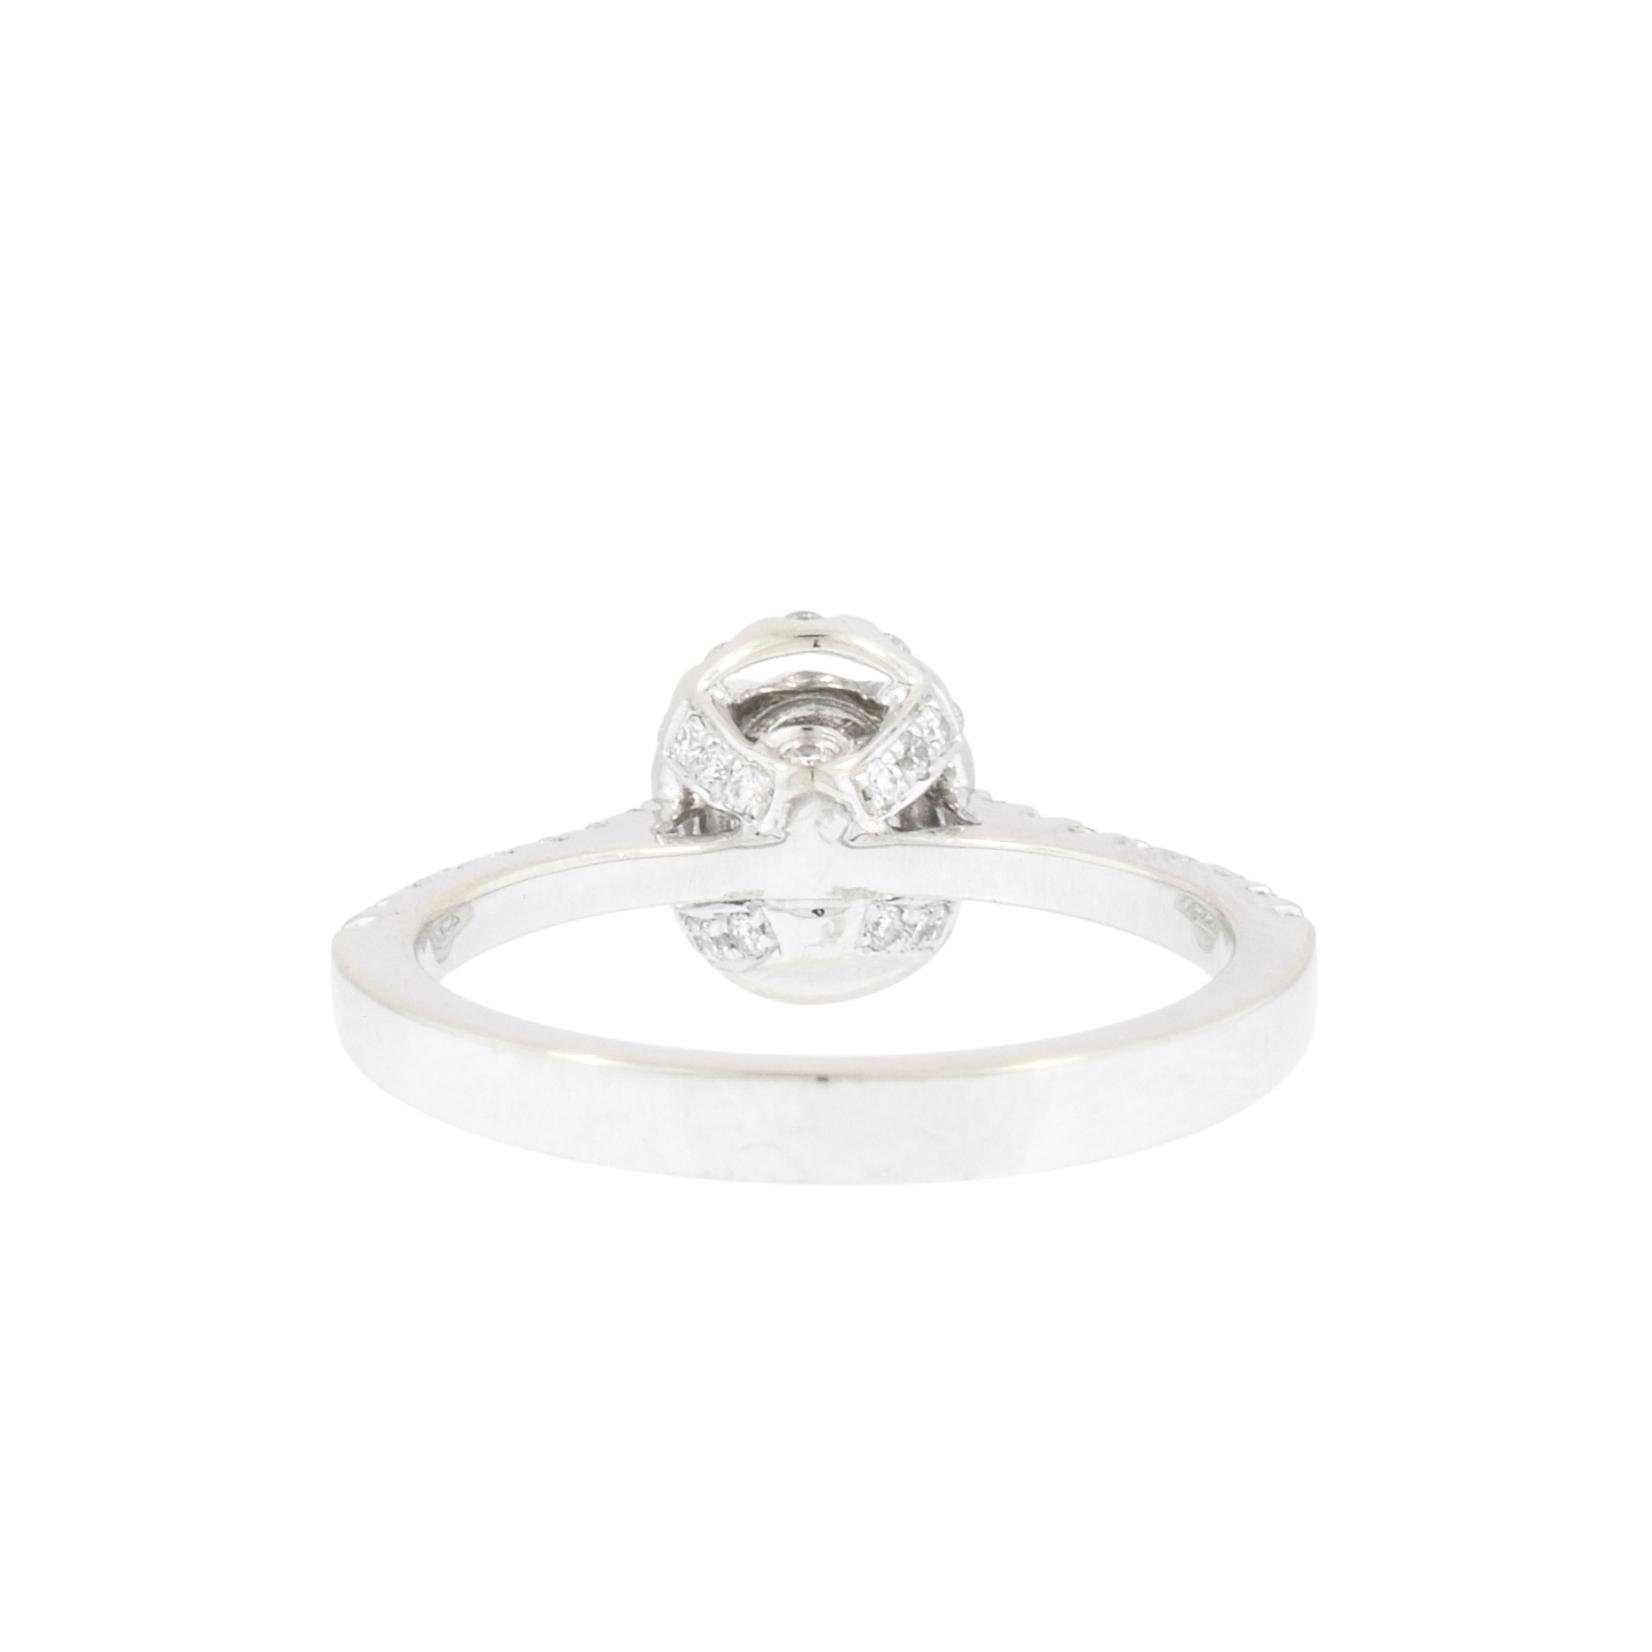 Oval Halo Diamond Engagement Ring